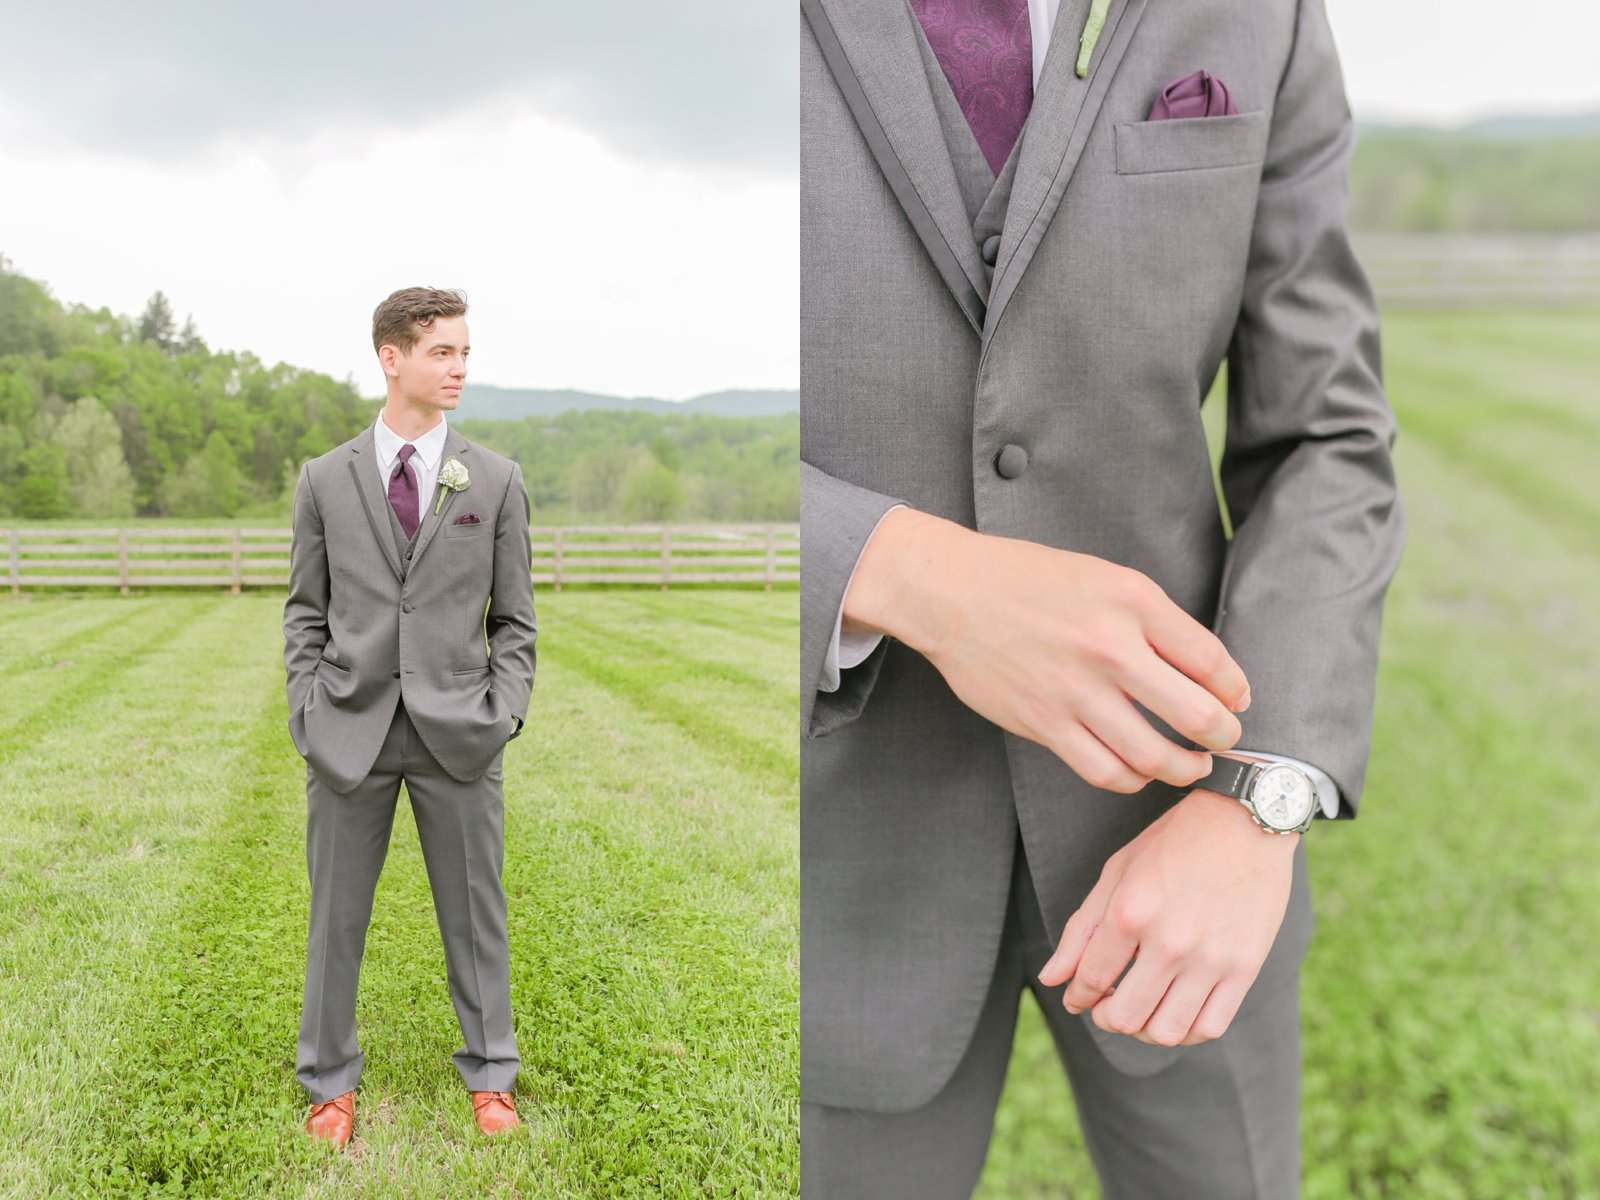 wedding_photographer_Missouri_Destination_elope_intimate_Saint_James_MO_Missouri_KansasCity_Jeff_City_Jefferson_Columbia_Engagement_Photos_Pictures_Session_Best_Videographer_0200.jpg